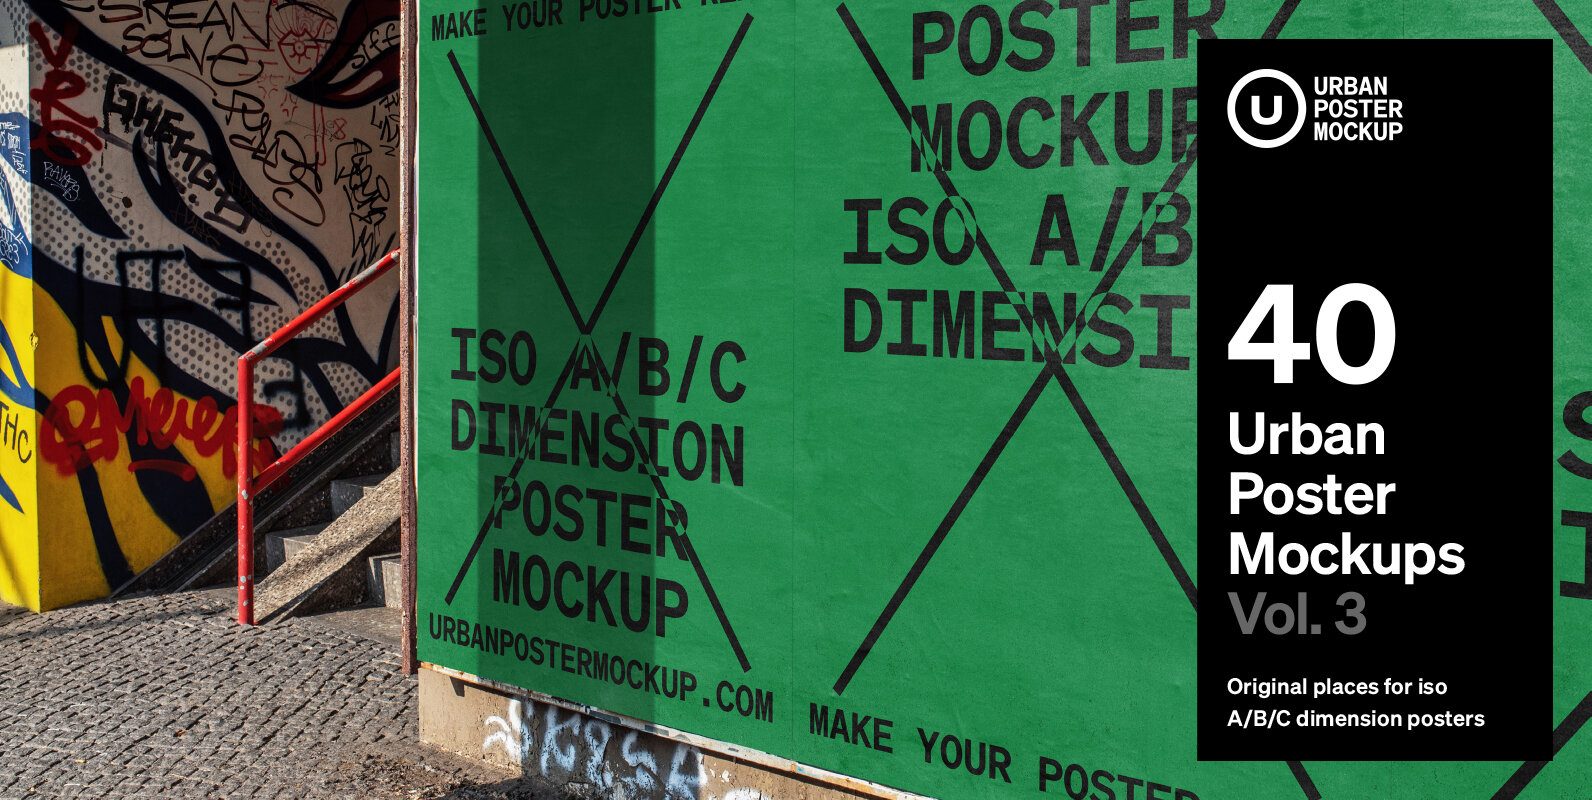 Urban Poster Mockup Vol.3